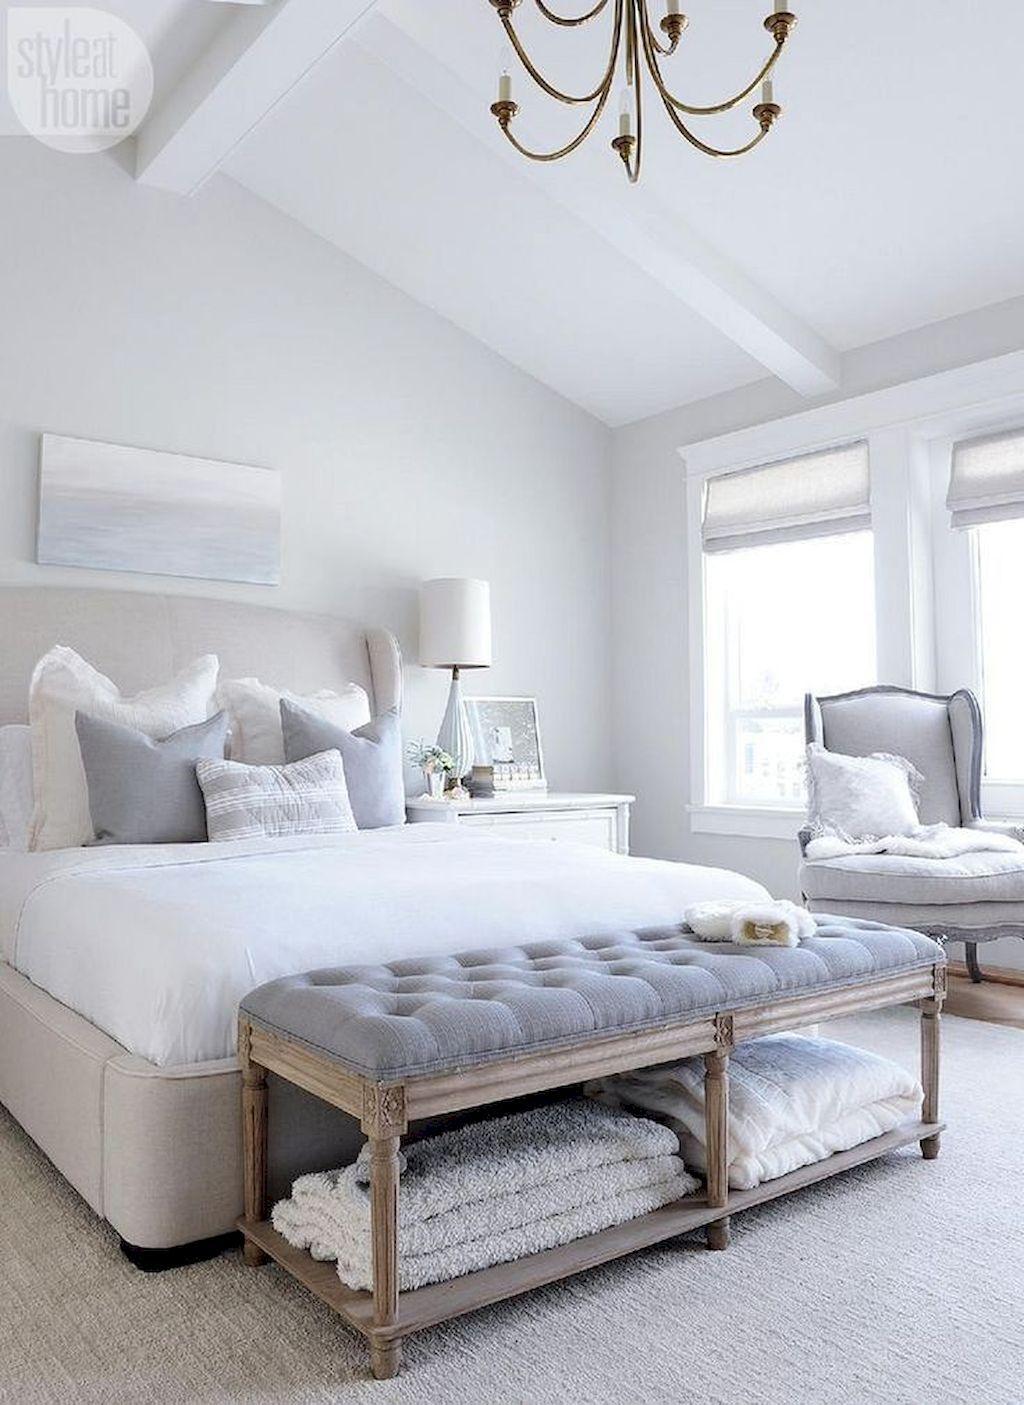 70 Beautiful Farmhouse Master Bedroom Decor Ideas images